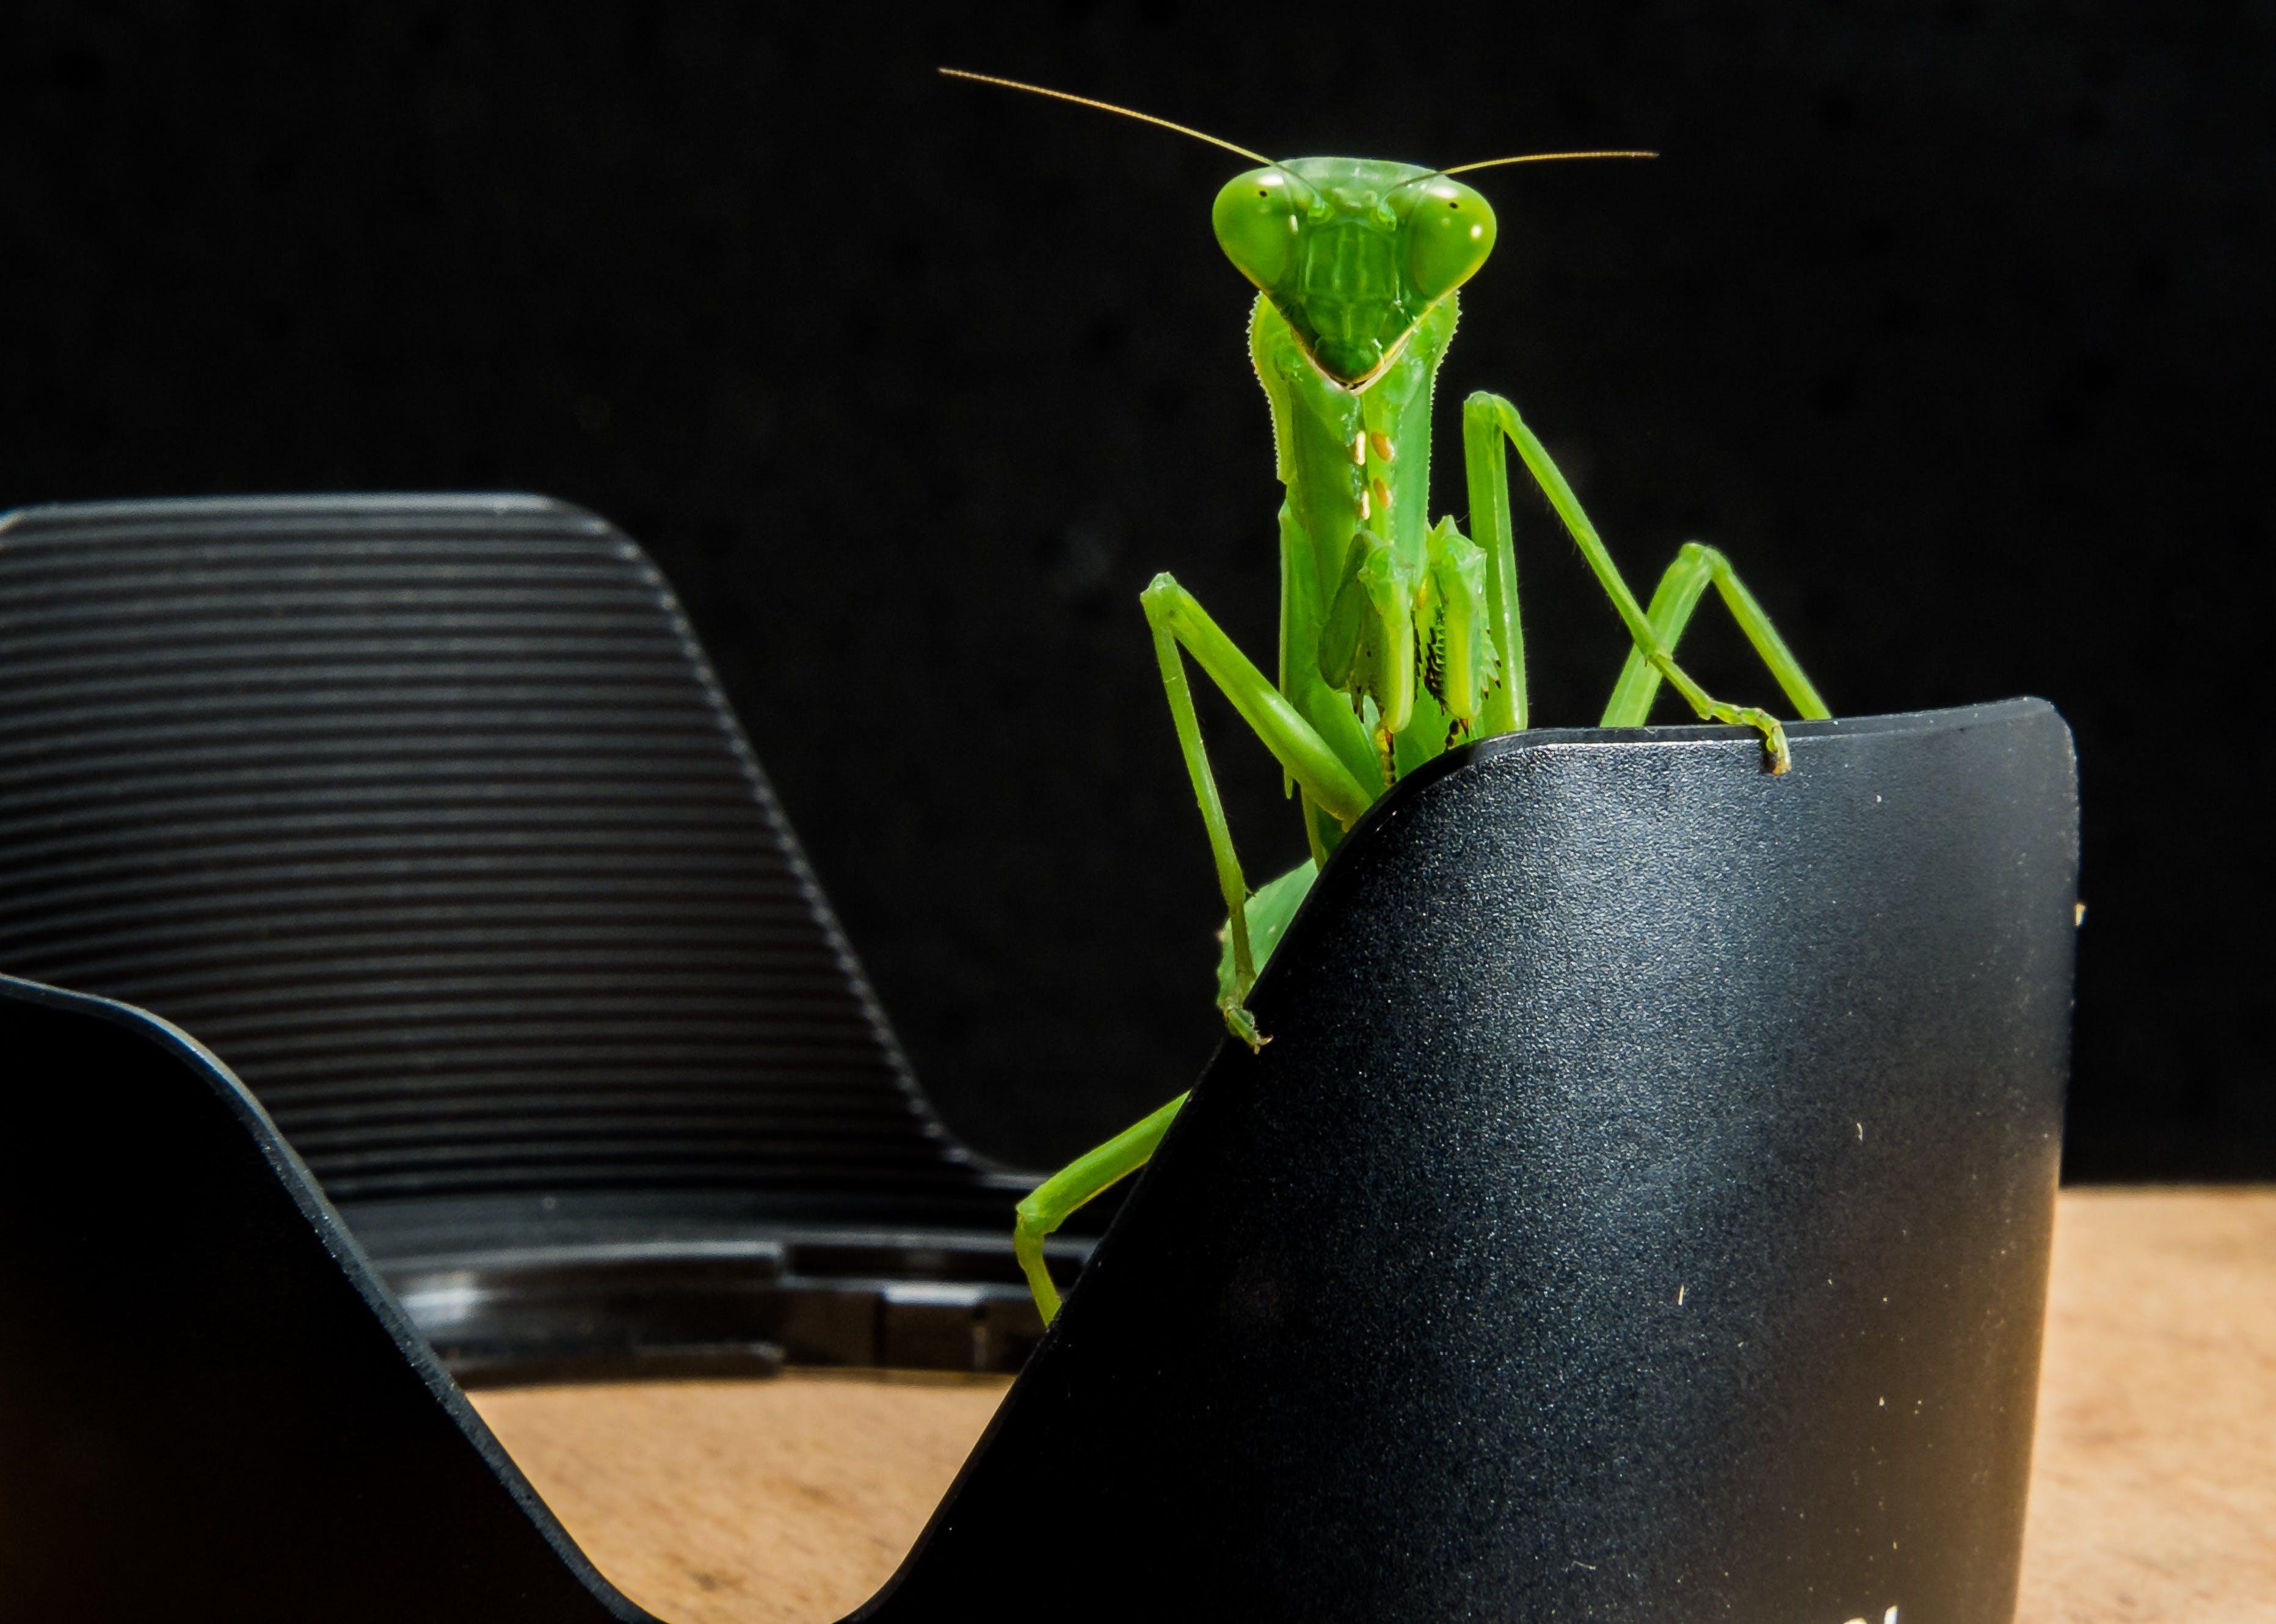 Green Grasshopper on Black Metal